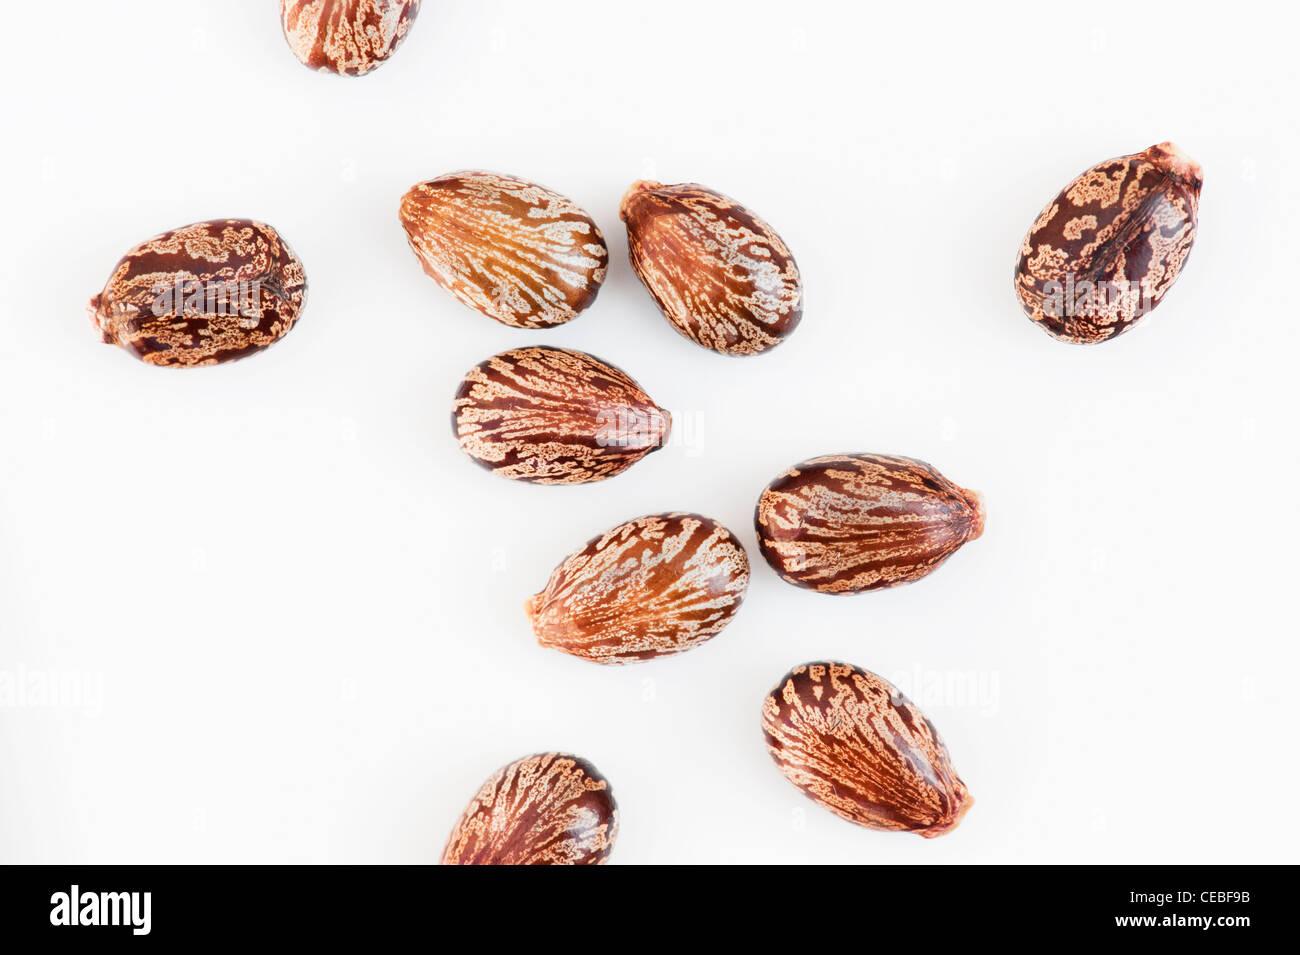 Ricinus communis. Castor oil seeds on white background - Stock Image